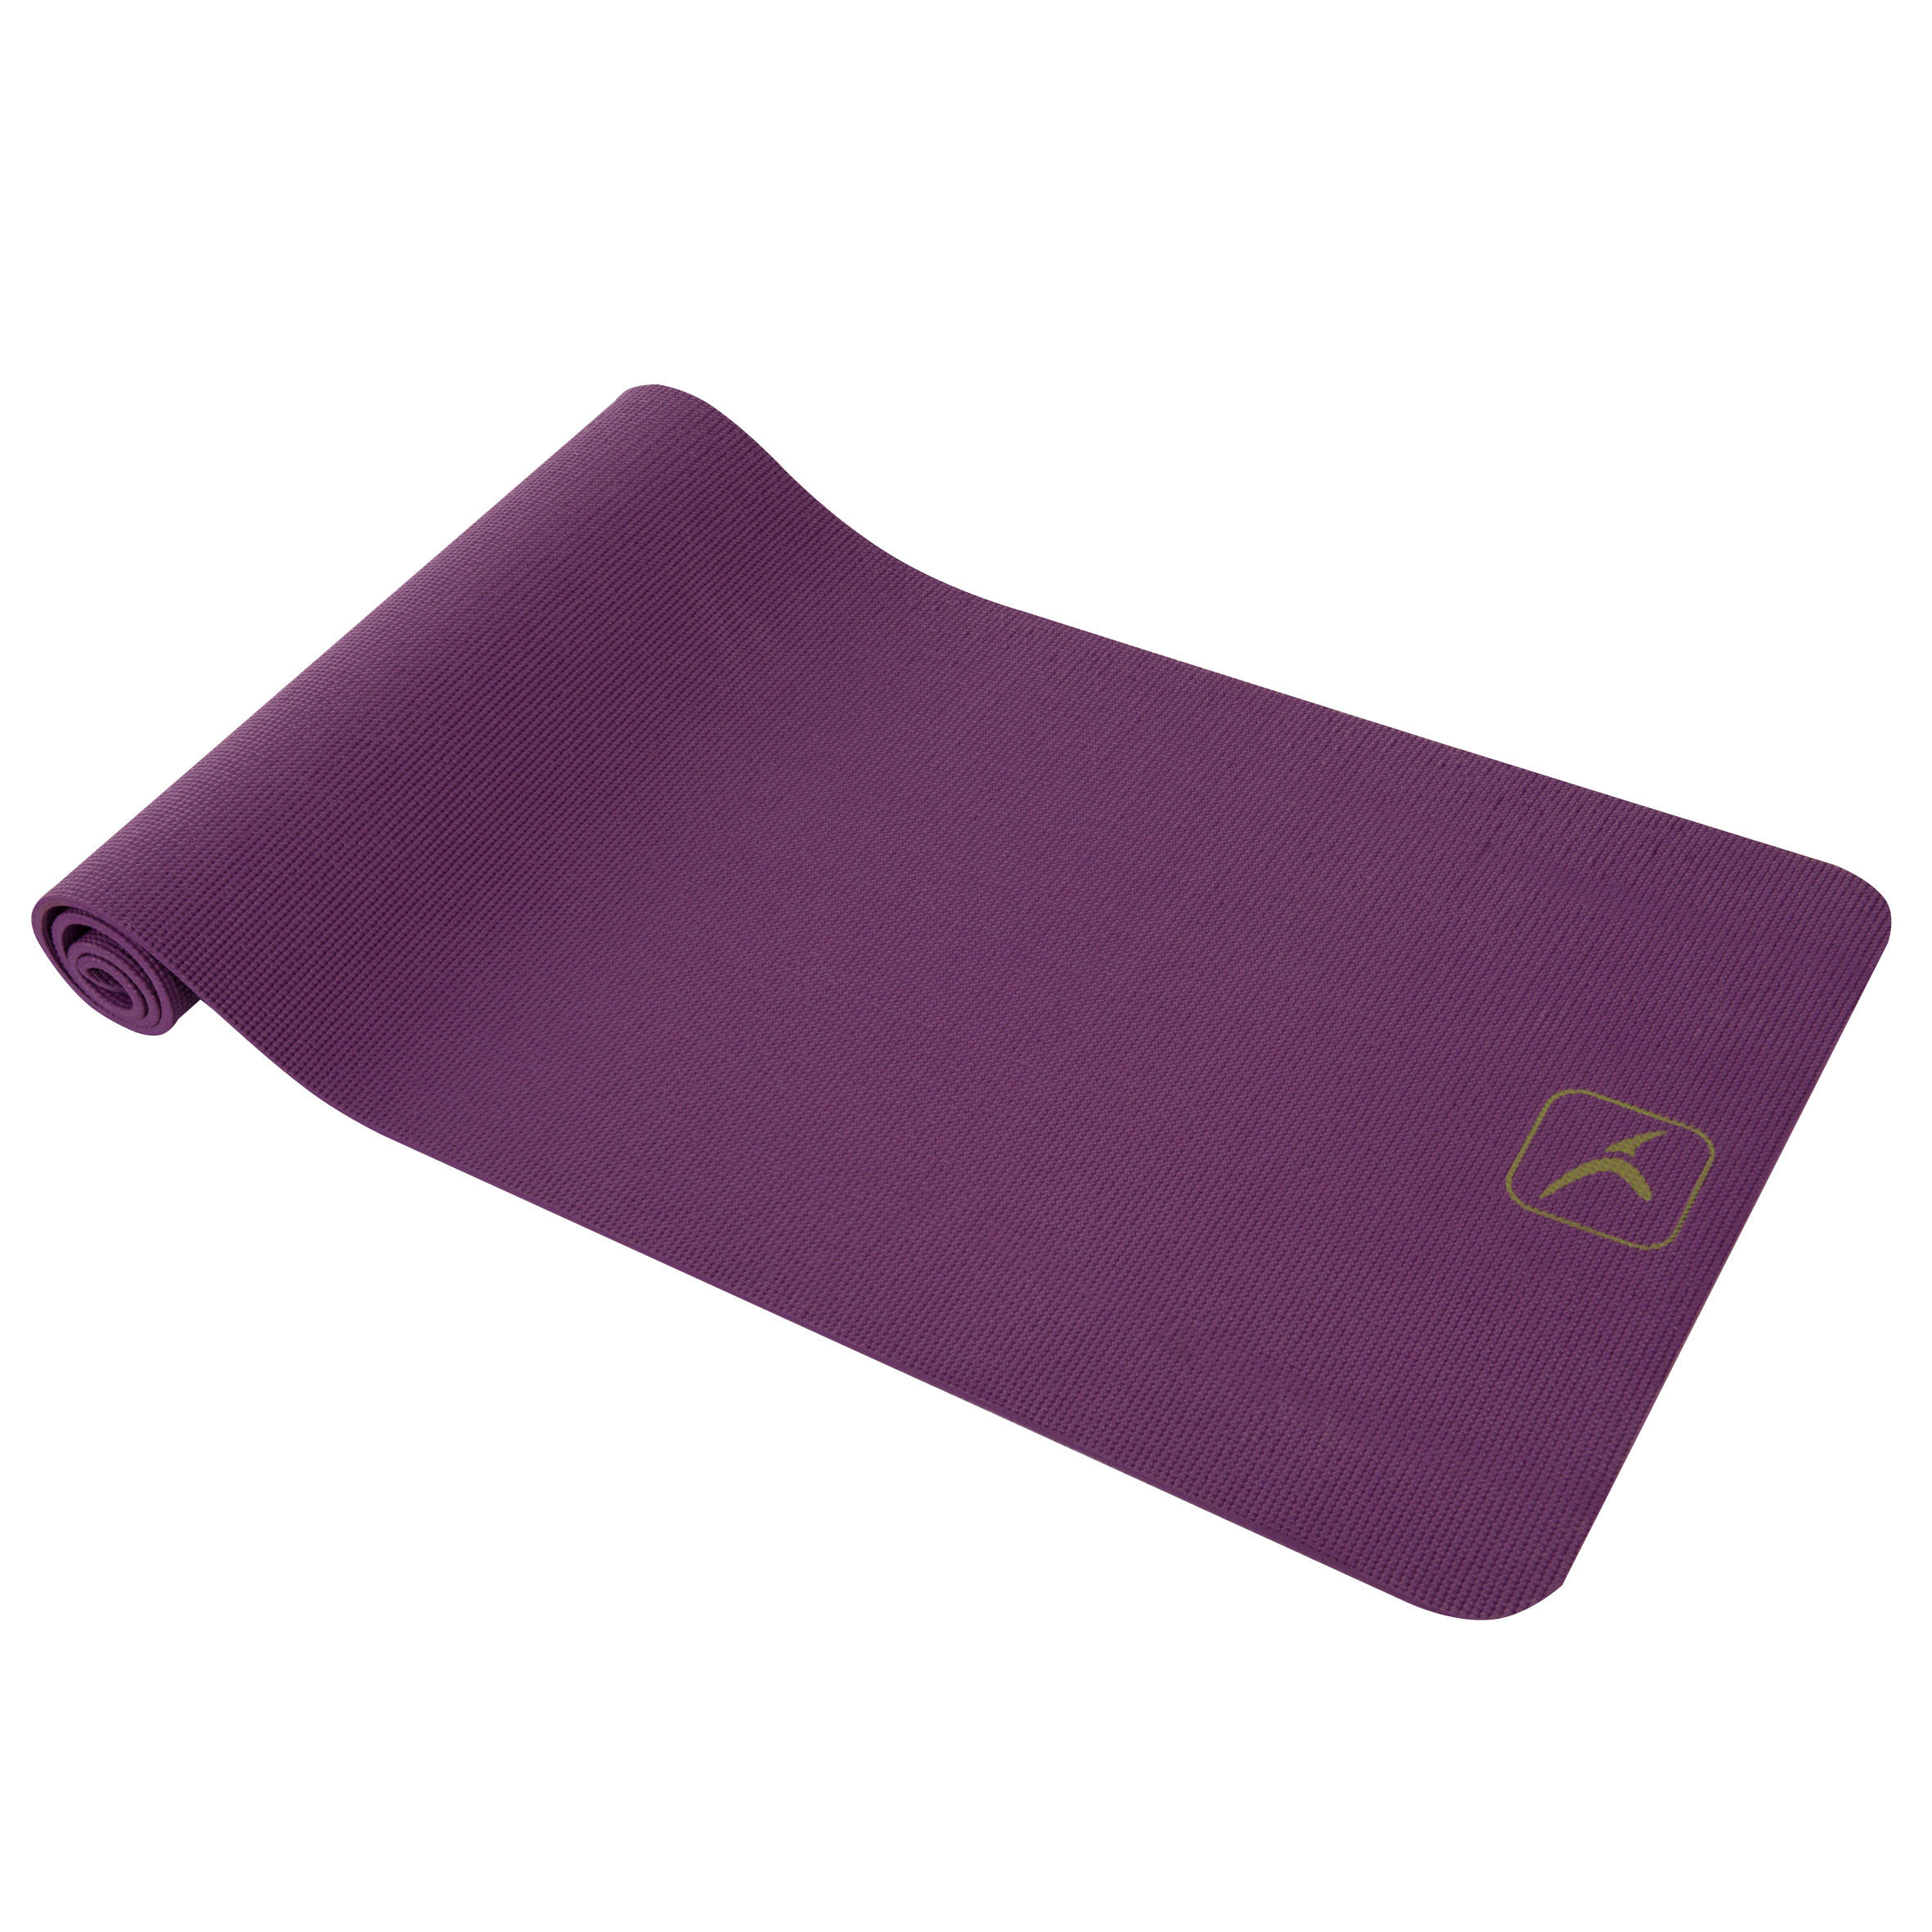 Yogamat Comfort 8 mm paars